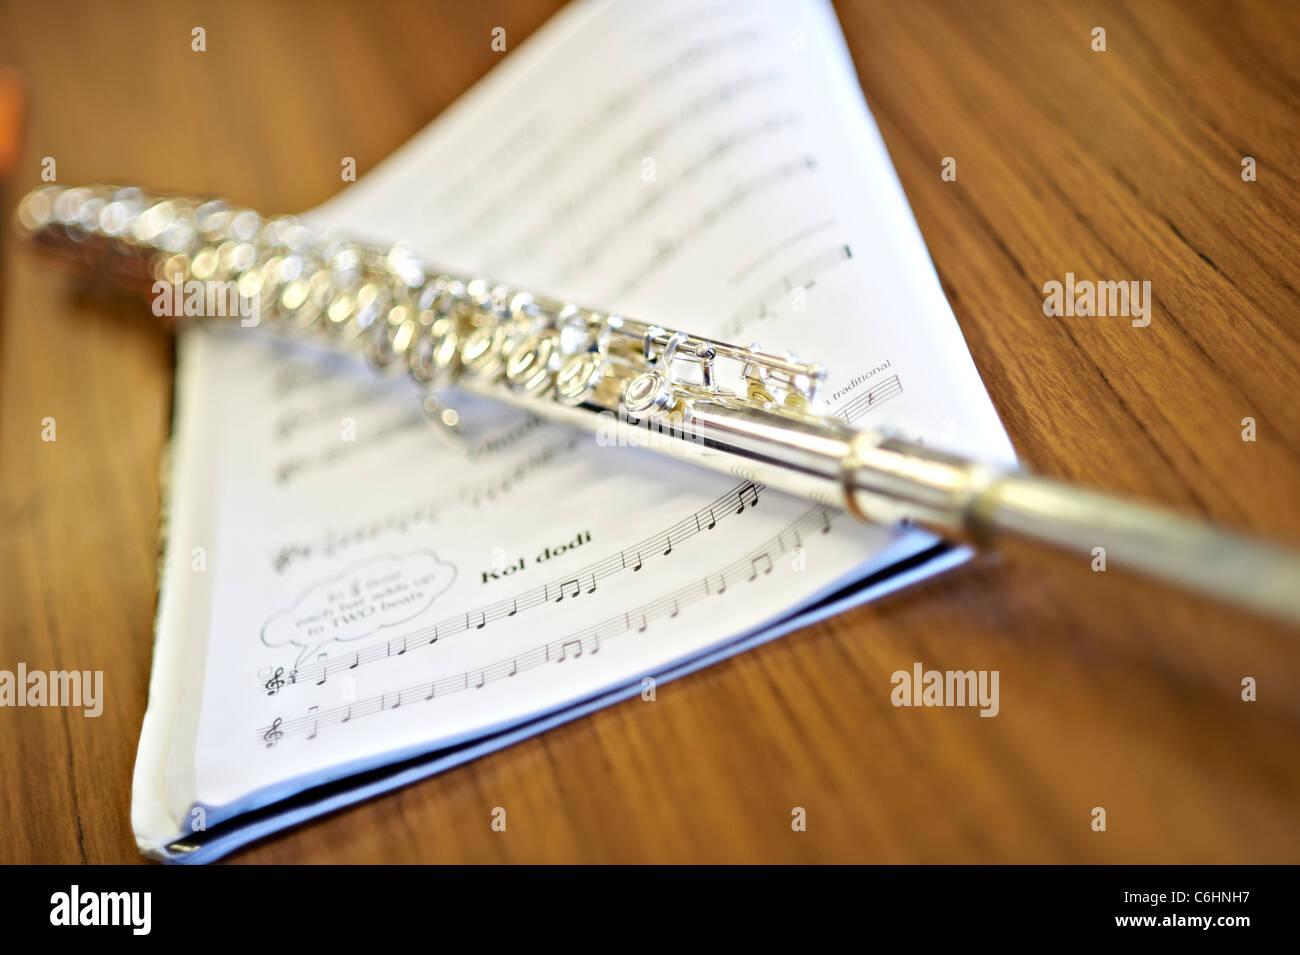 flute score - Stock Image